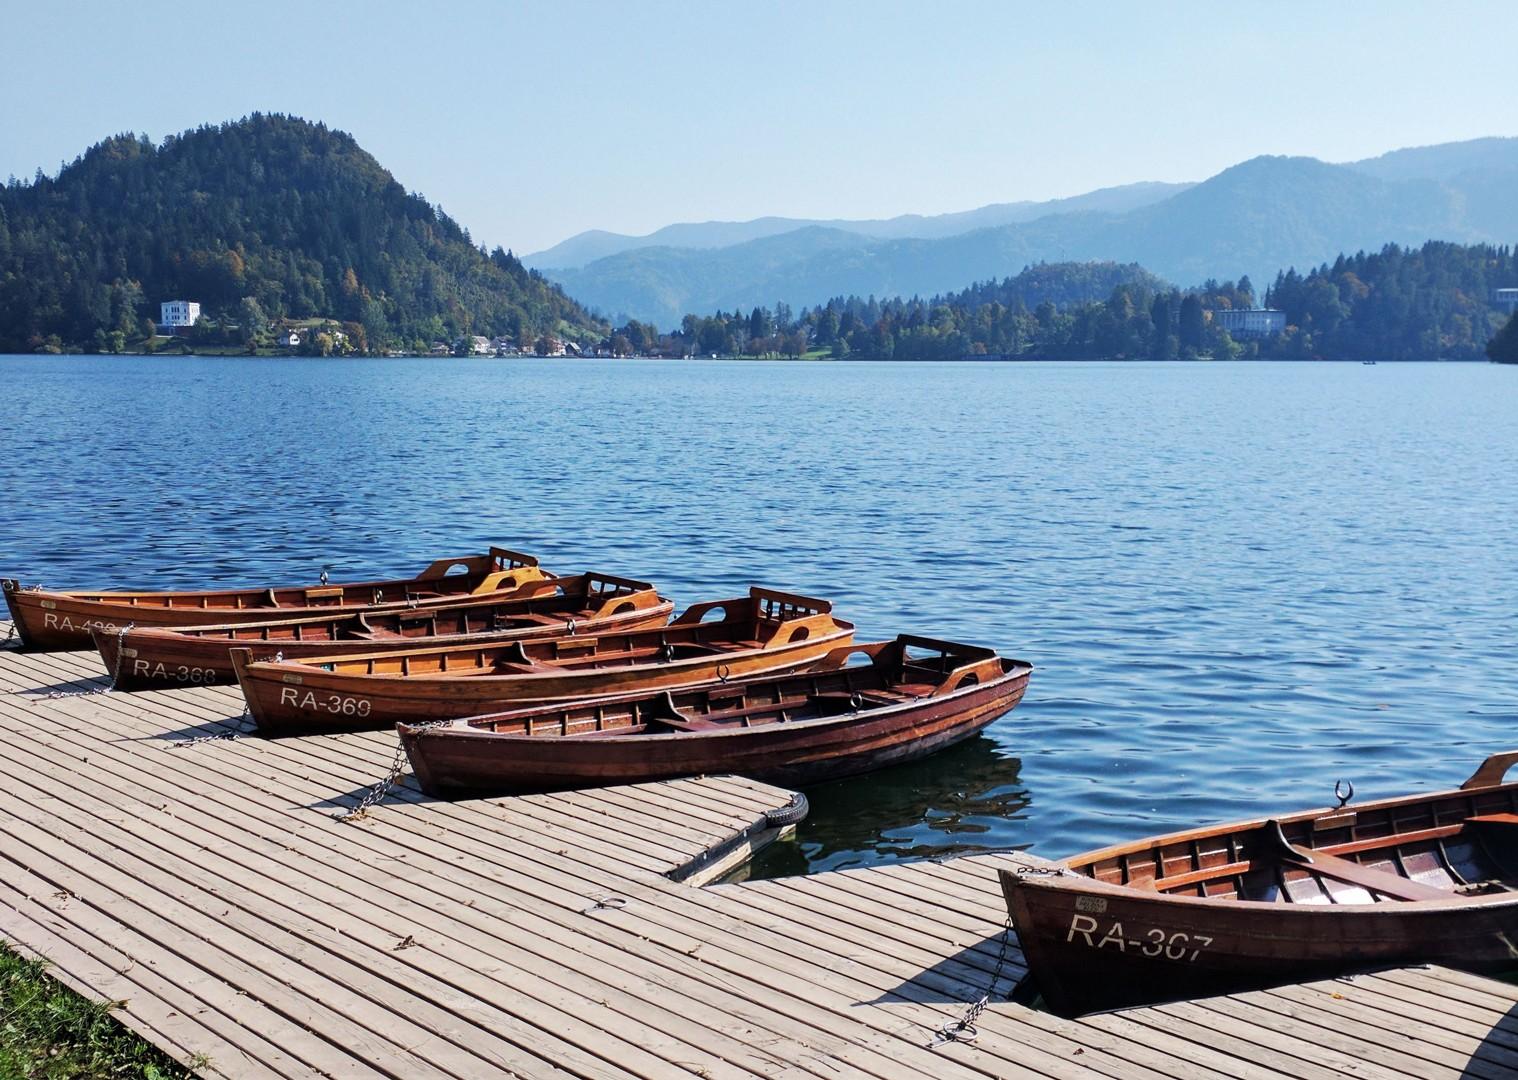 vintgar-lake-bled-slovenia-family-cycling-holiday.jpg - Slovenia - Magical Lake Bled - Self-Guided Family Cycling Holiday - Family Cycling